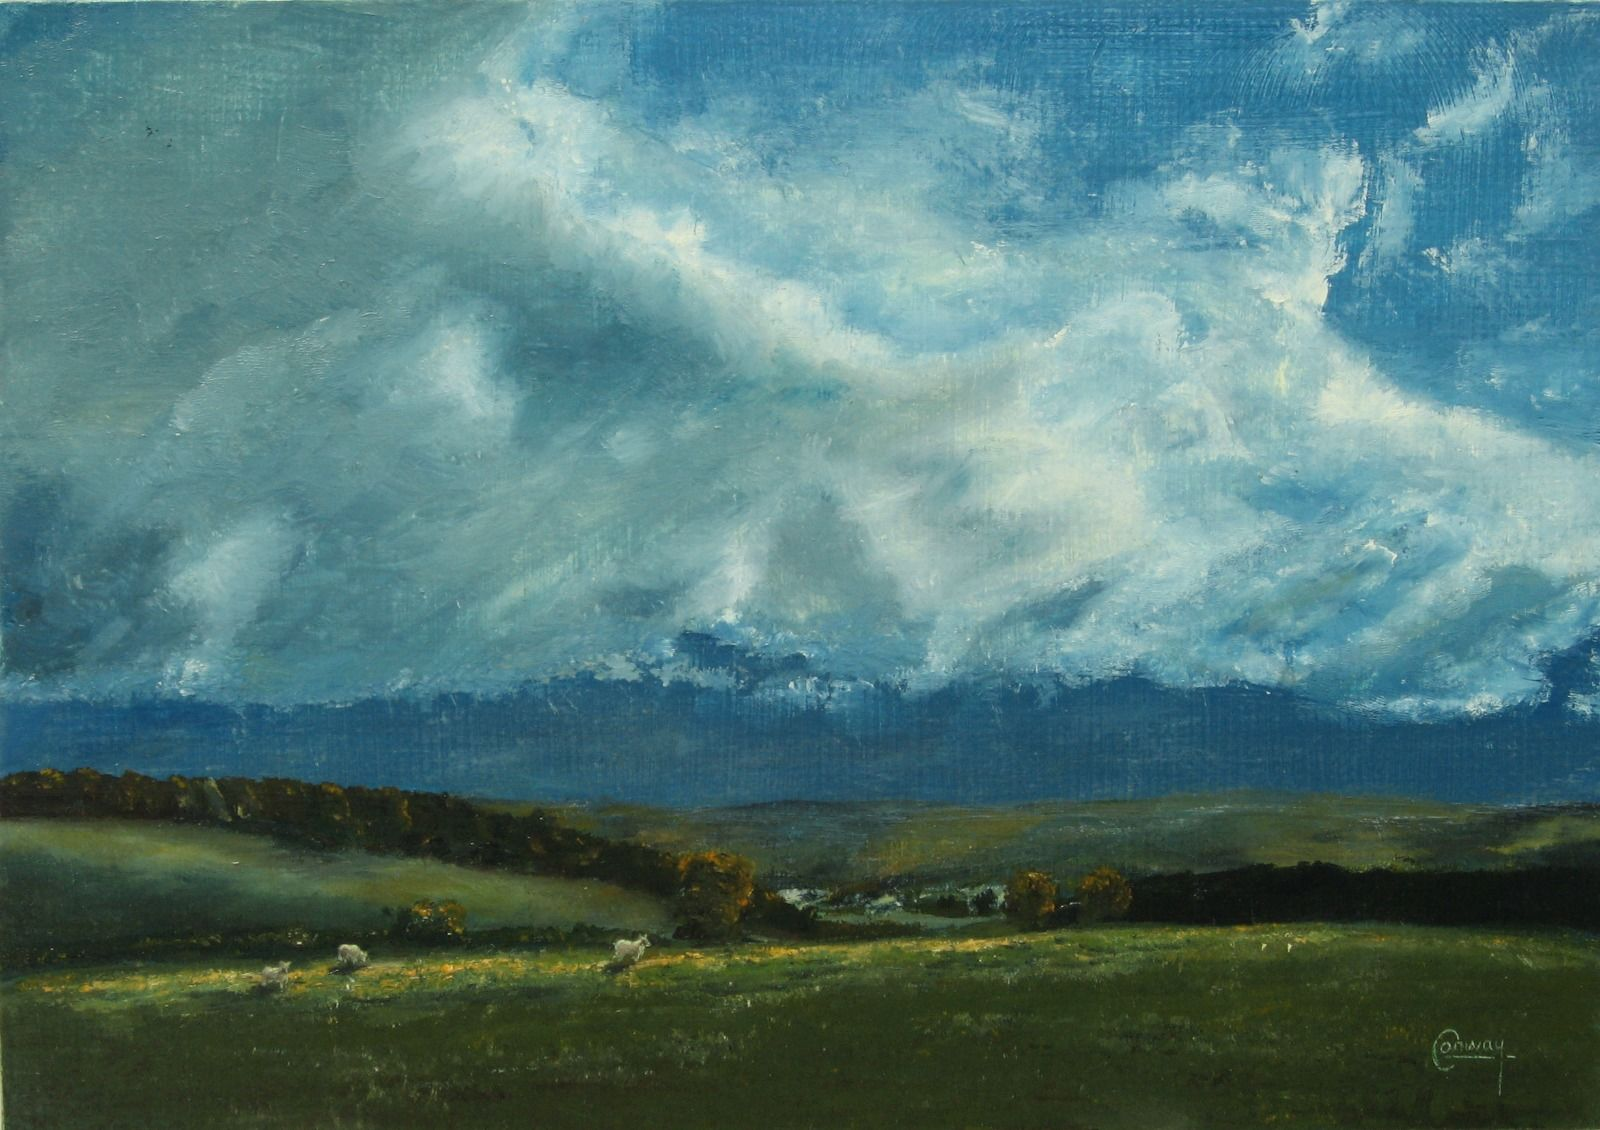 'Sky and Sheep, Looking South' - Llansawel, Carmarthenshire